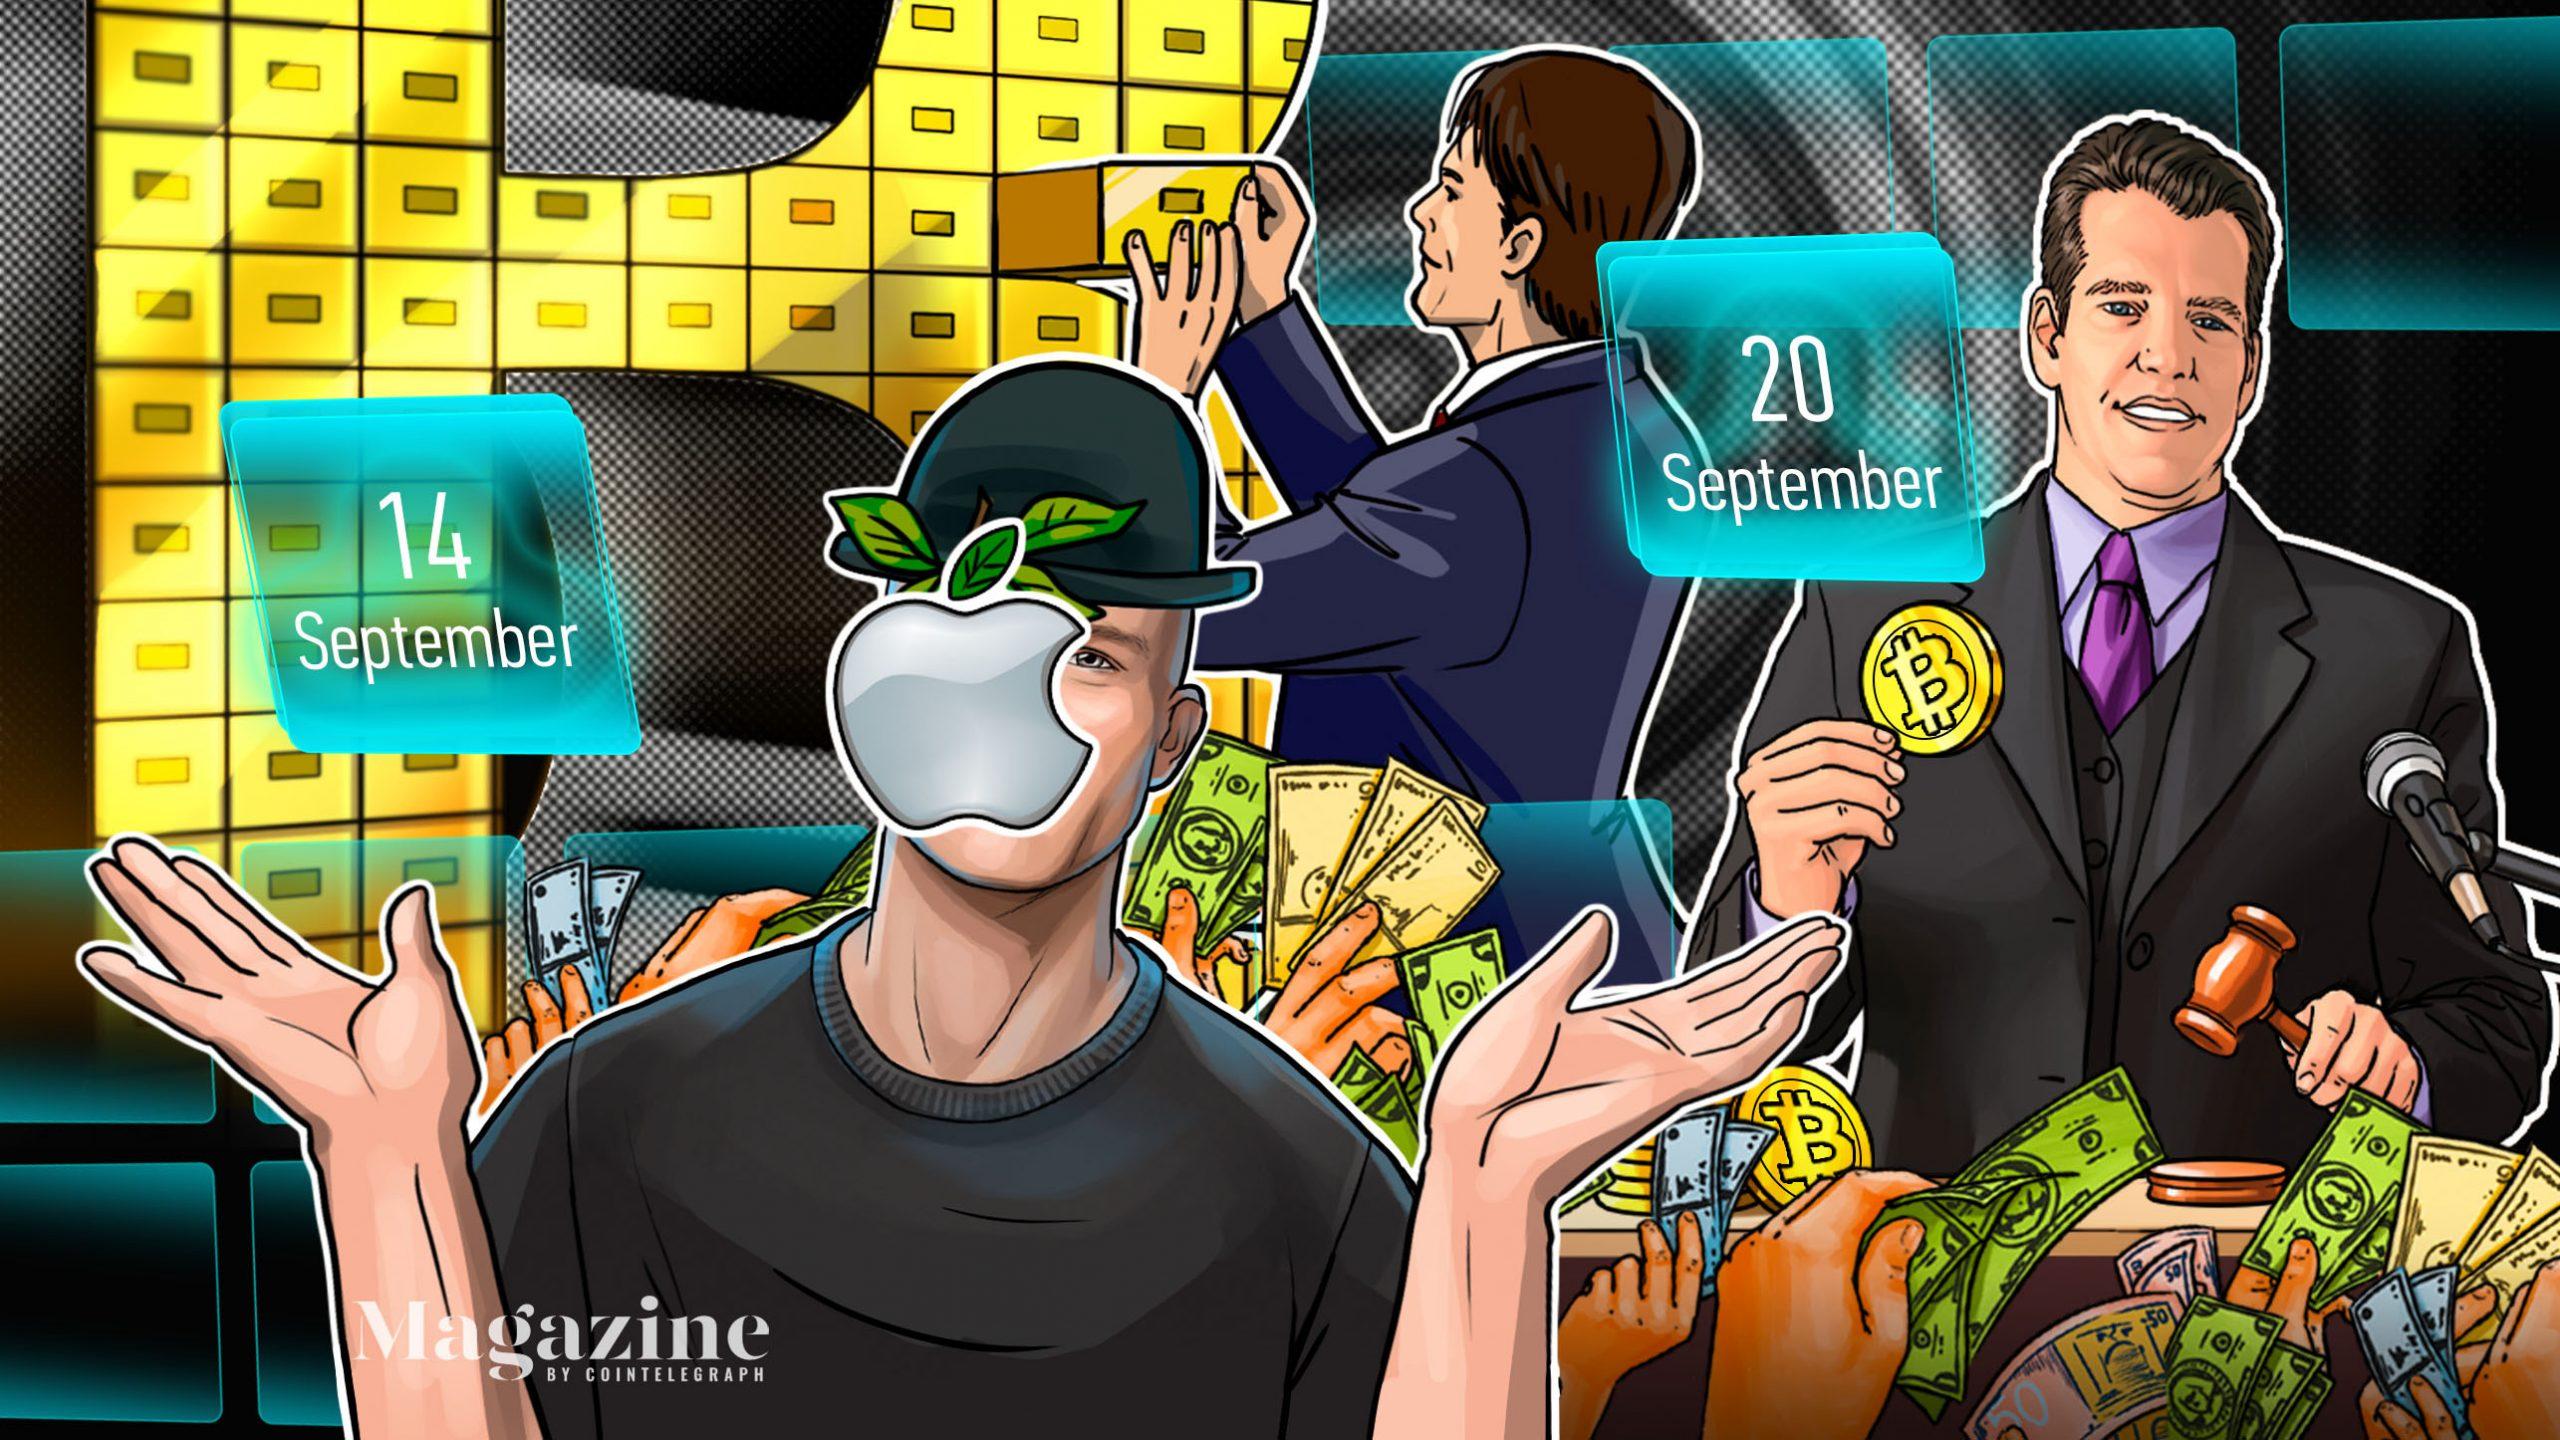 Uniswap payday, ETH transactions hit record high, EU backs stablecoins: Hodler's Digest, Sept. 14–20